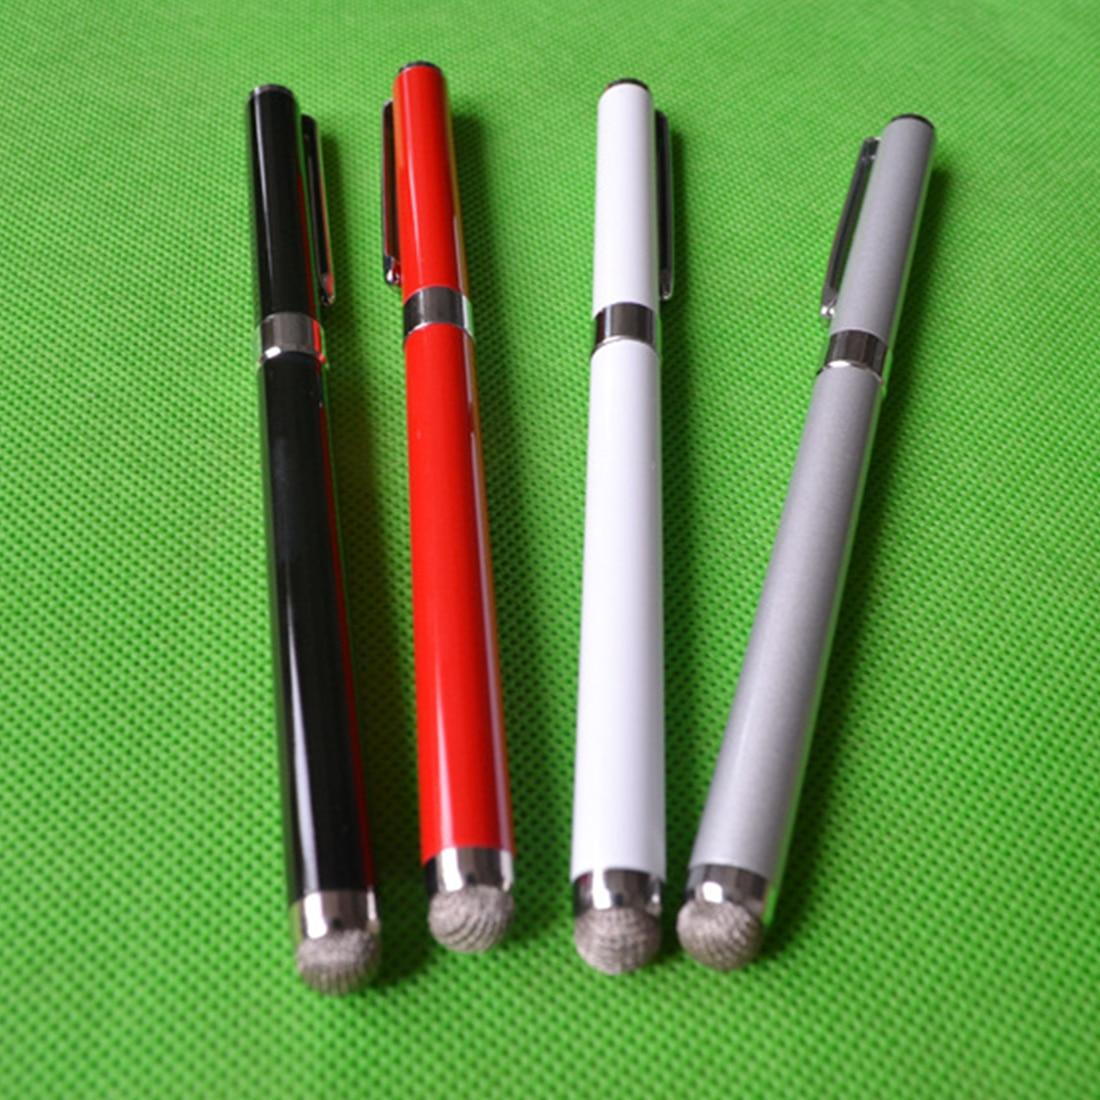 Touch Screen pen Conductive cloth capacitance pen Conductive fiber stylus Dual-use  pen Nano stylus pen Touch Screen pen Conductive cloth capacitance pen Conductive fiber stylus Dual-use  pen Nano stylus pen